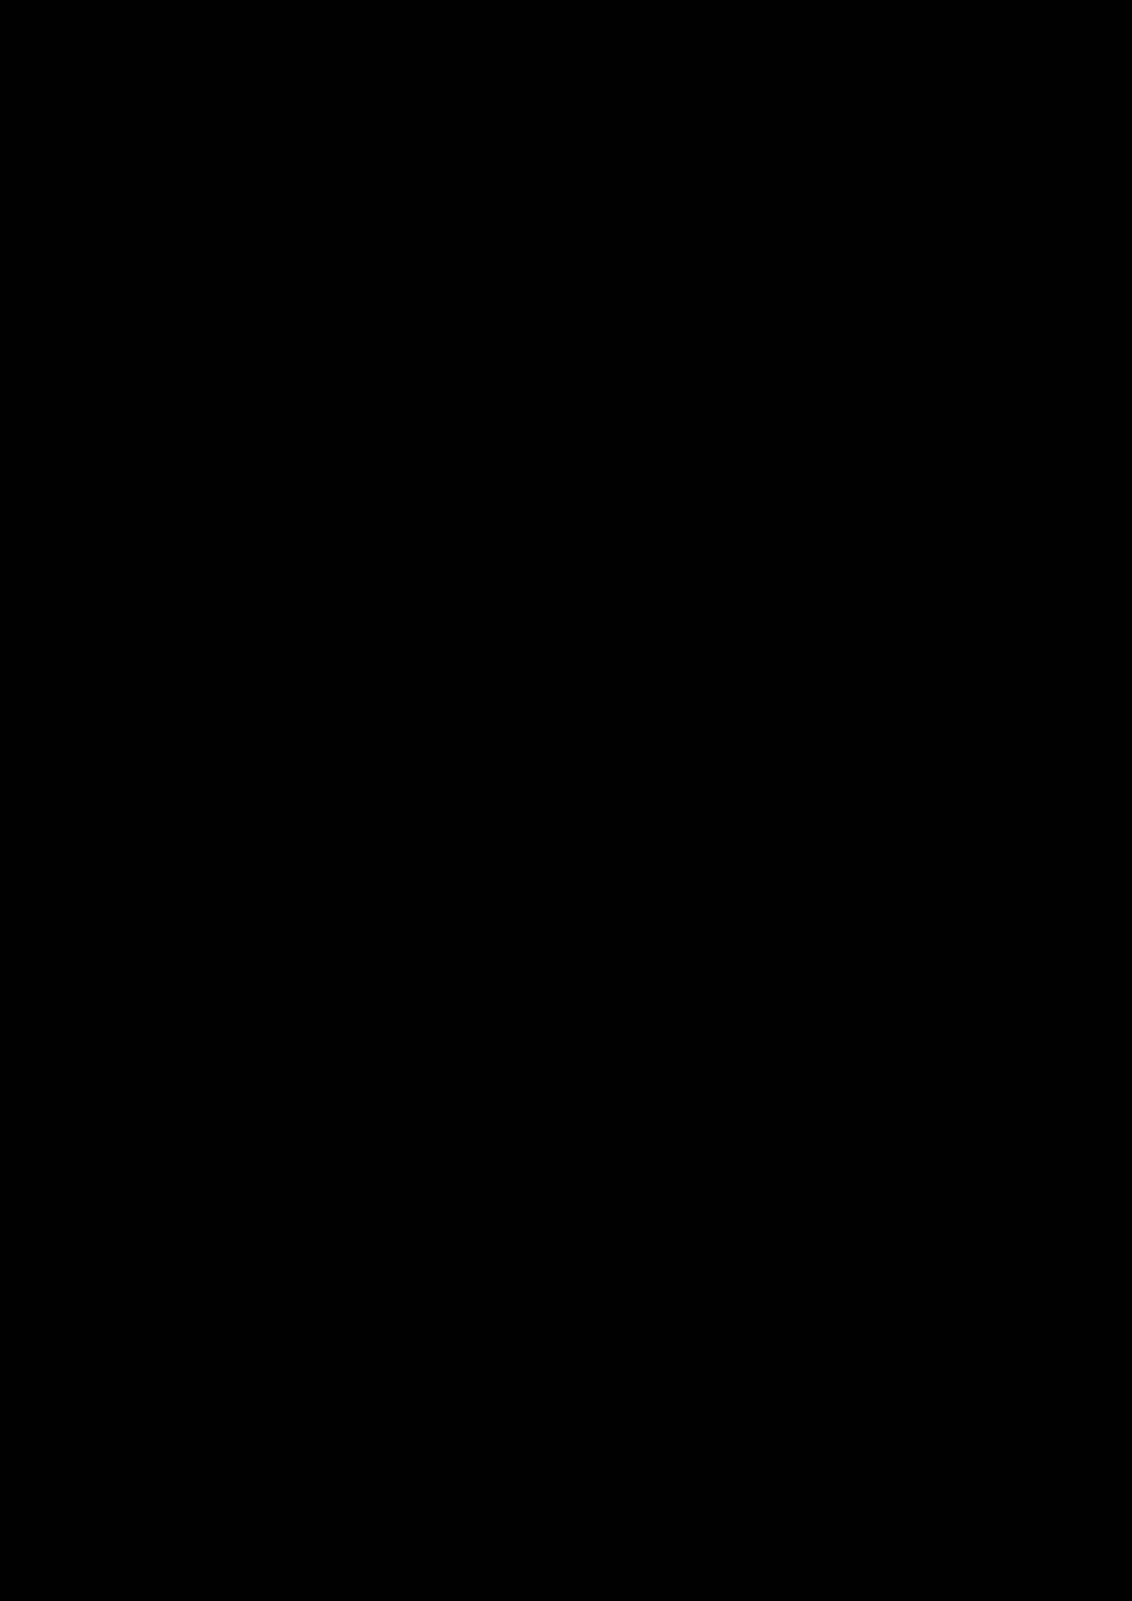 Ispoved Pervogo Boga slide, Image 35